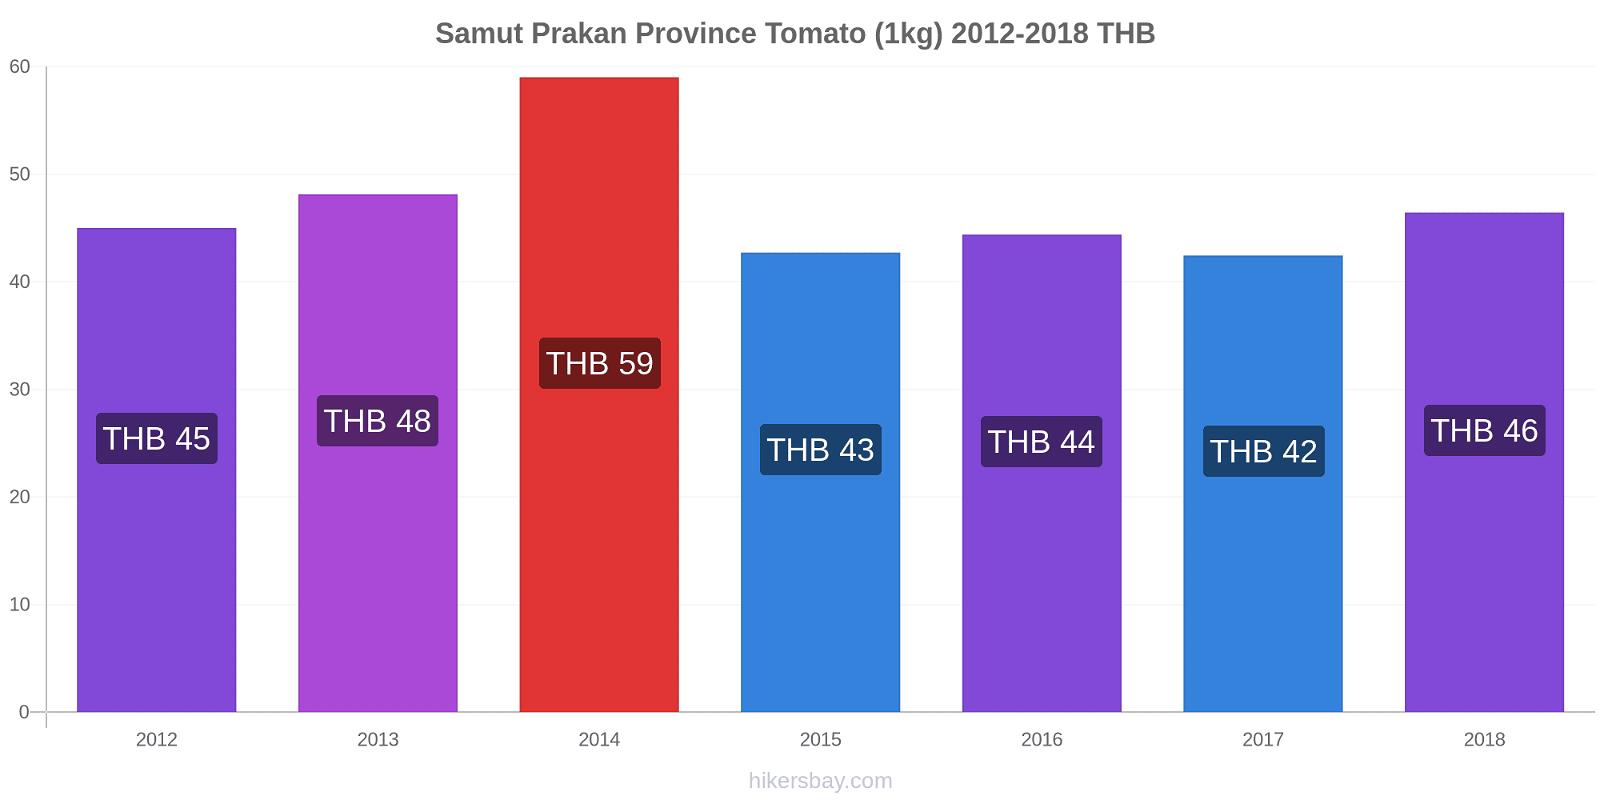 Samut Prakan Province price changes Tomato (1kg) hikersbay.com